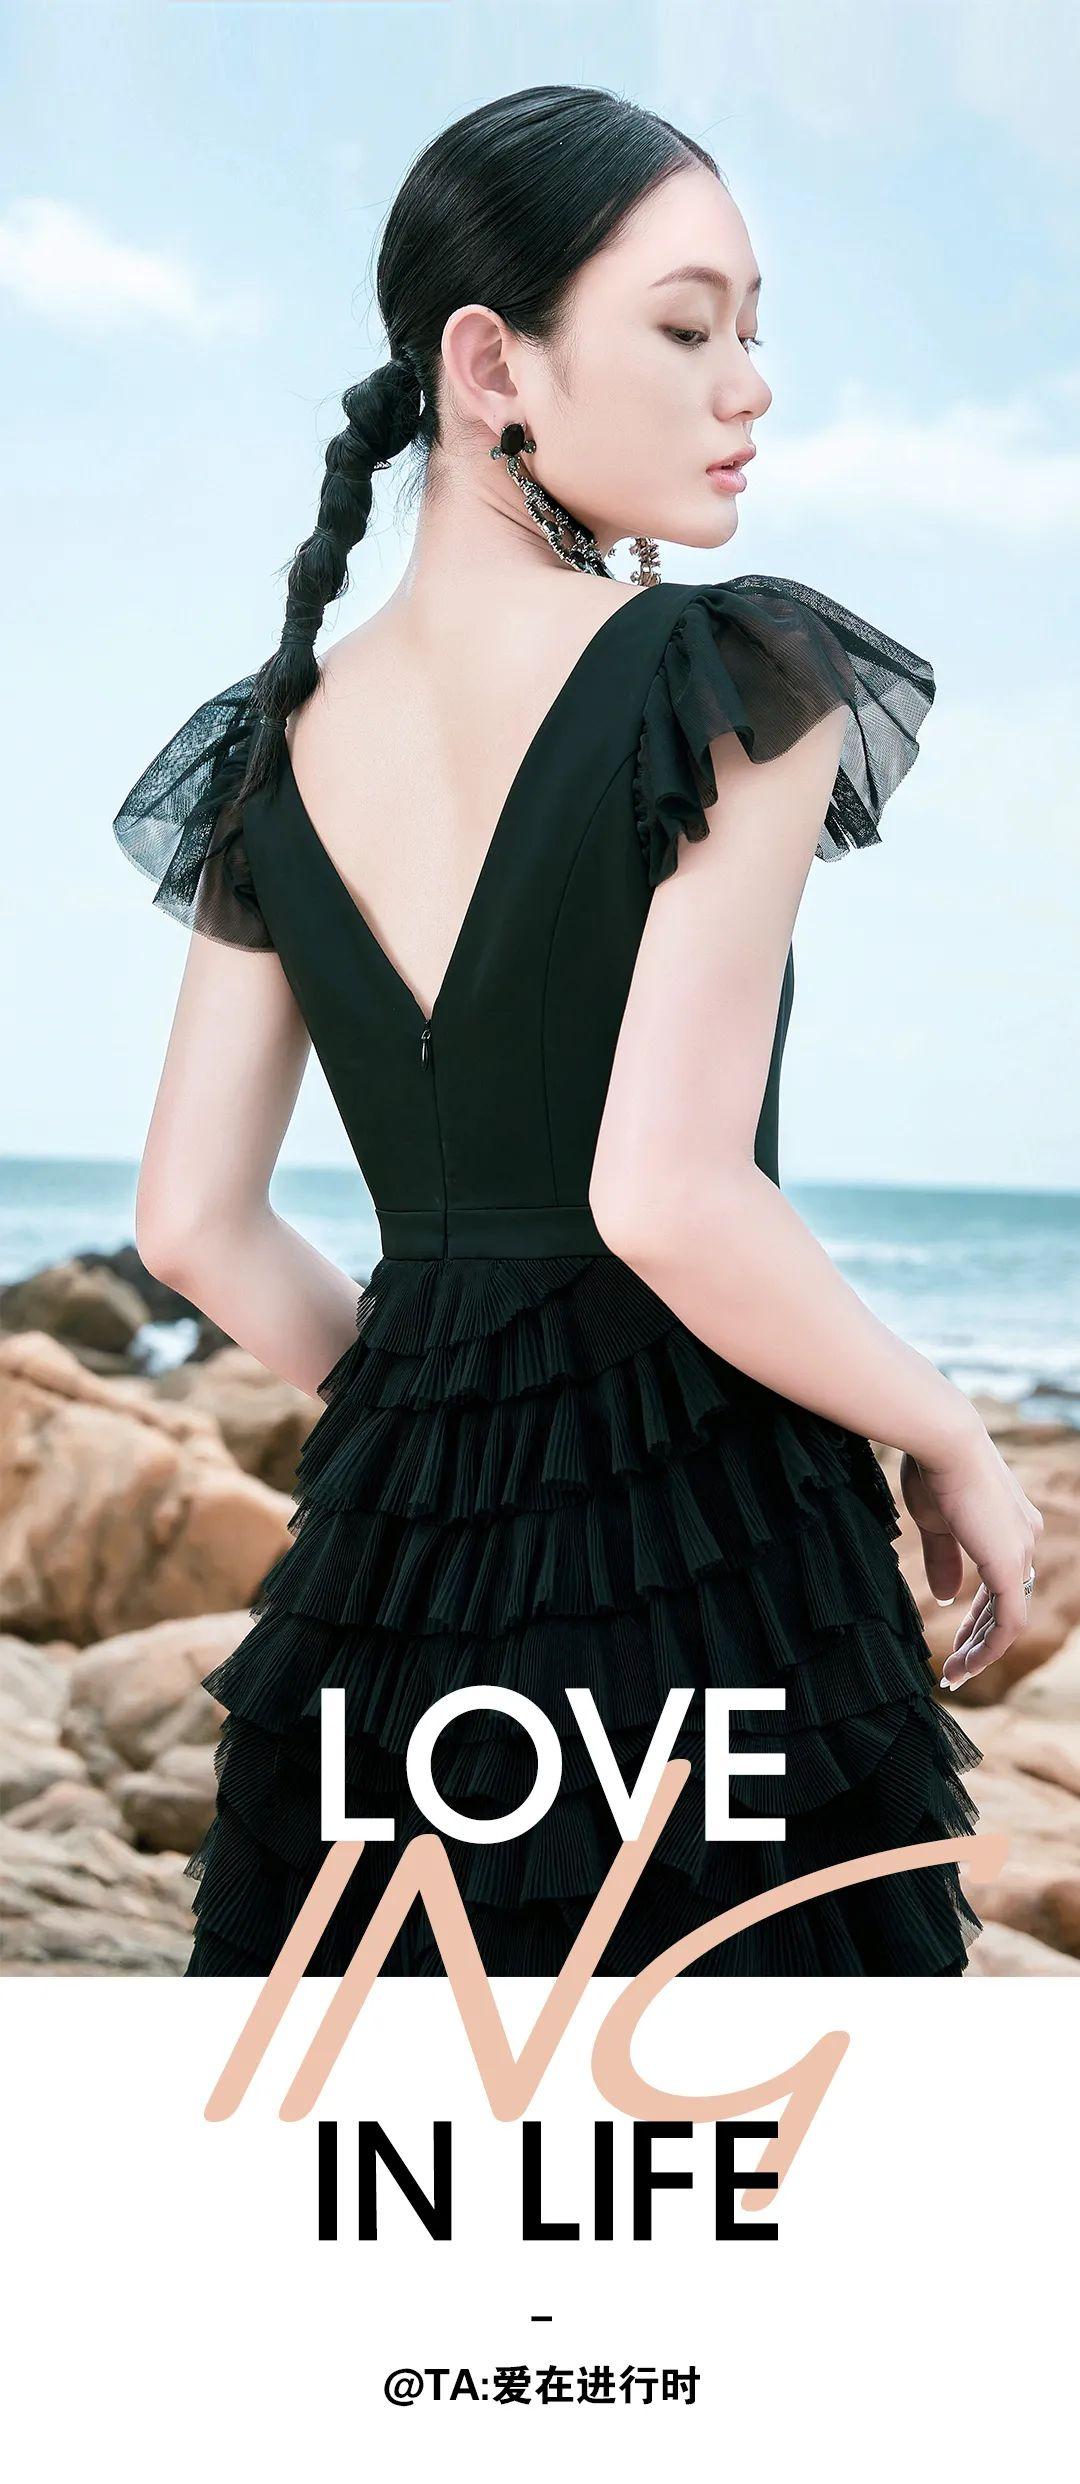 ANOTHERONE:LOVE IN · 520 平平也温暖 无声也浪漫